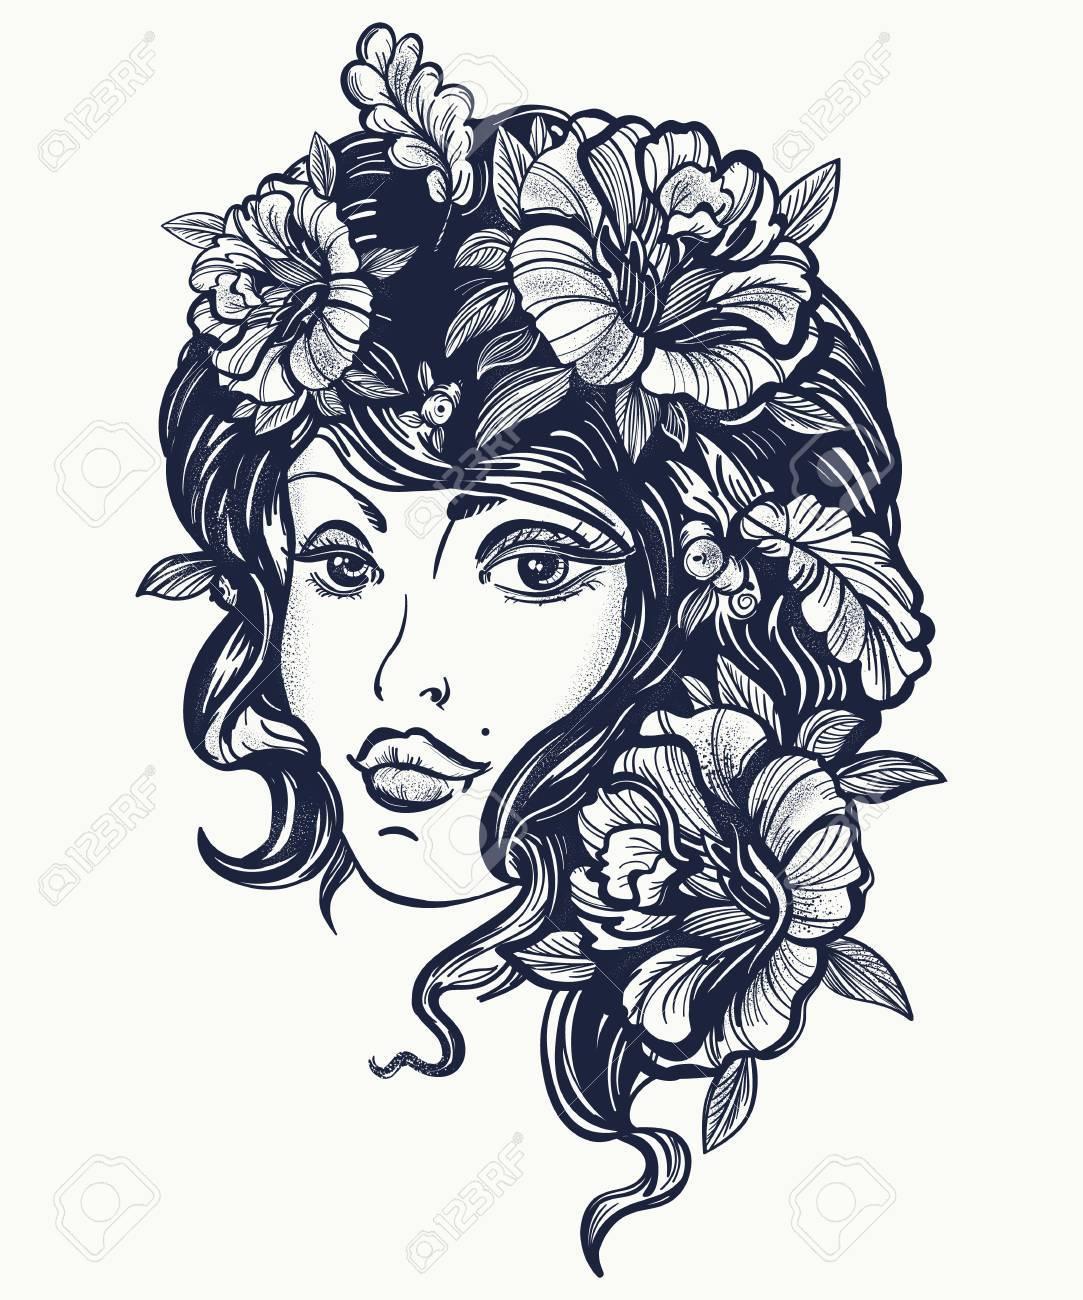 Tatuaje De La Vieja Escuela De La Mujer De La Naturaleza Del Otoño